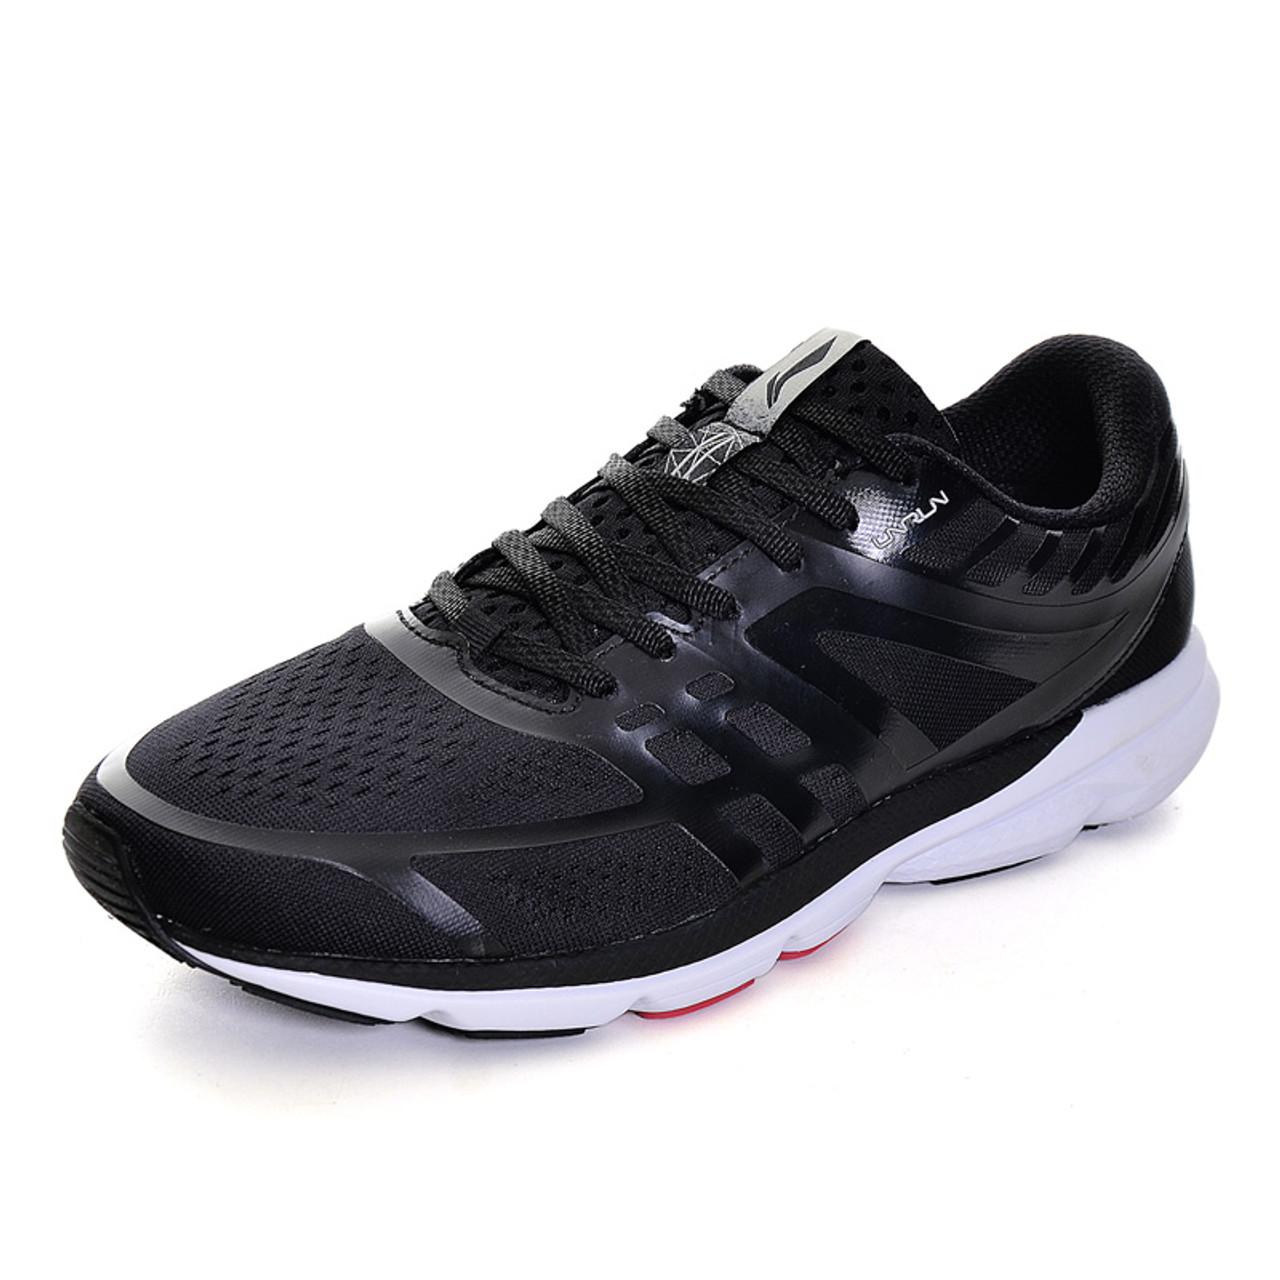 Li Ning Men Rouge Rabbit 2017 Smart Running Shoes Smart